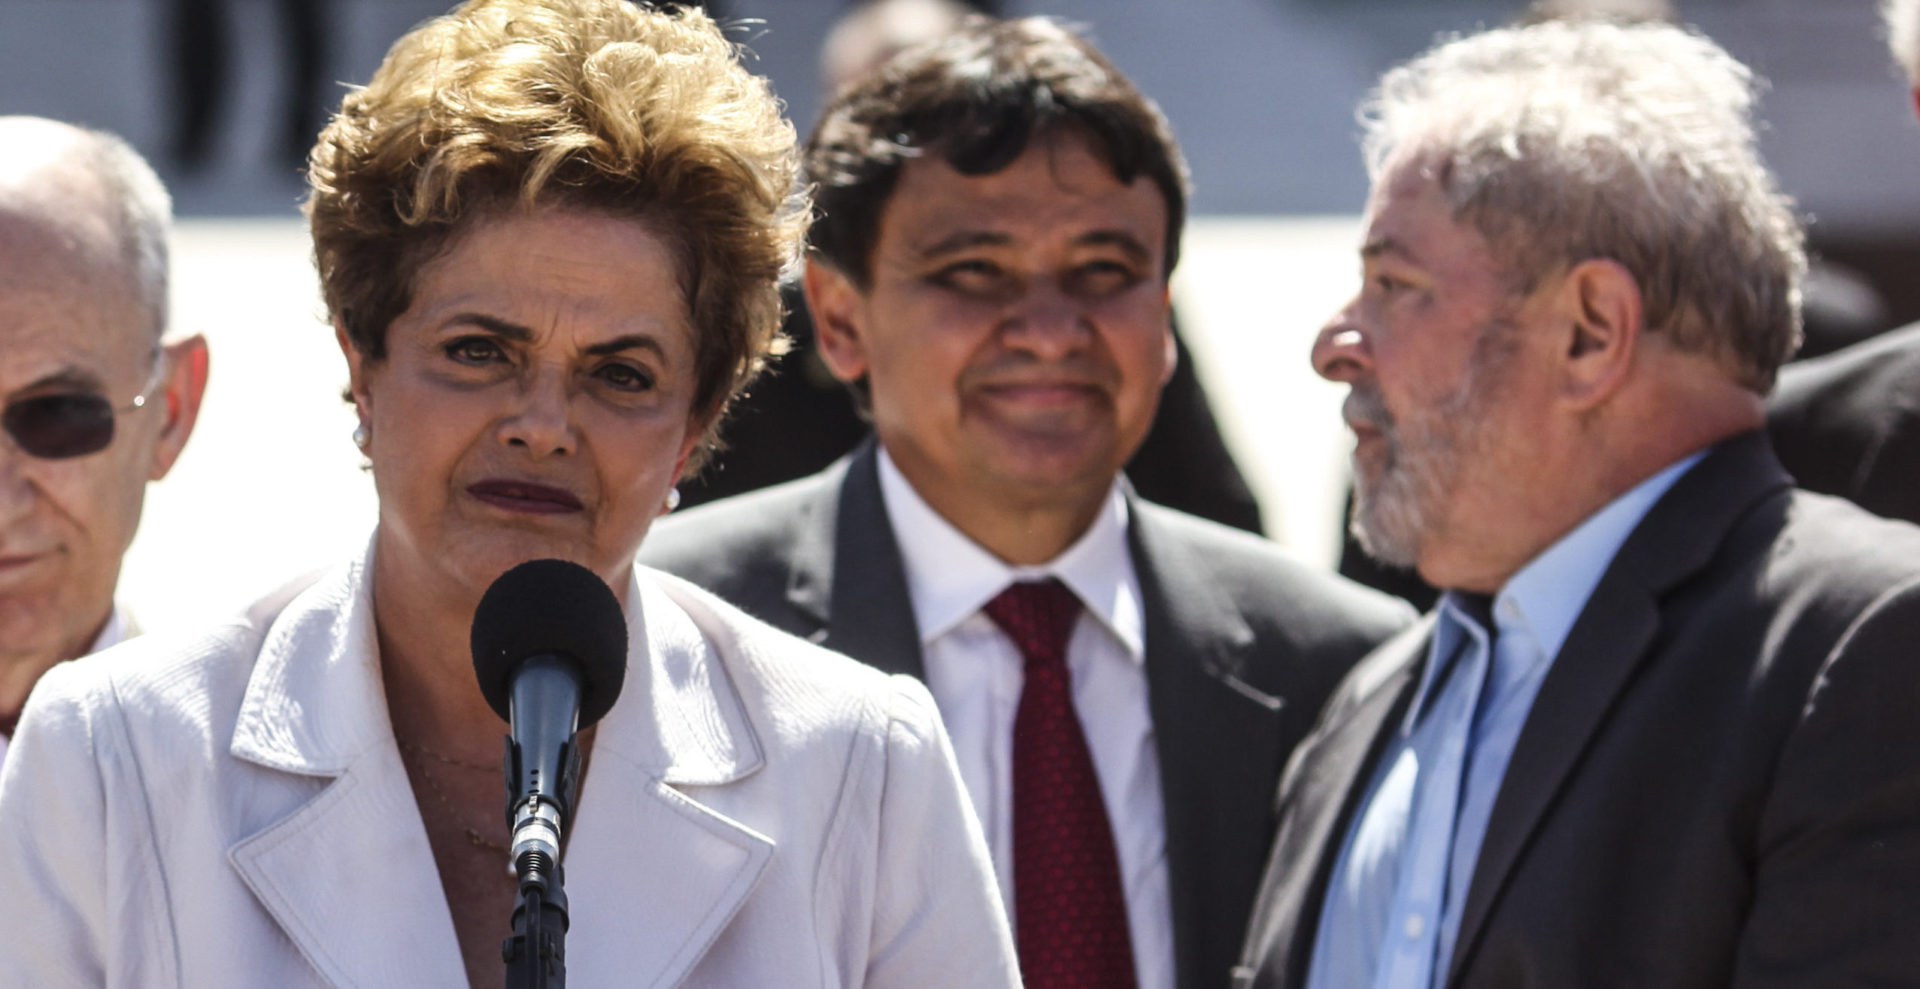 La presidenta de Brasil, Dilma Rousseff, suspendida de su cargo.